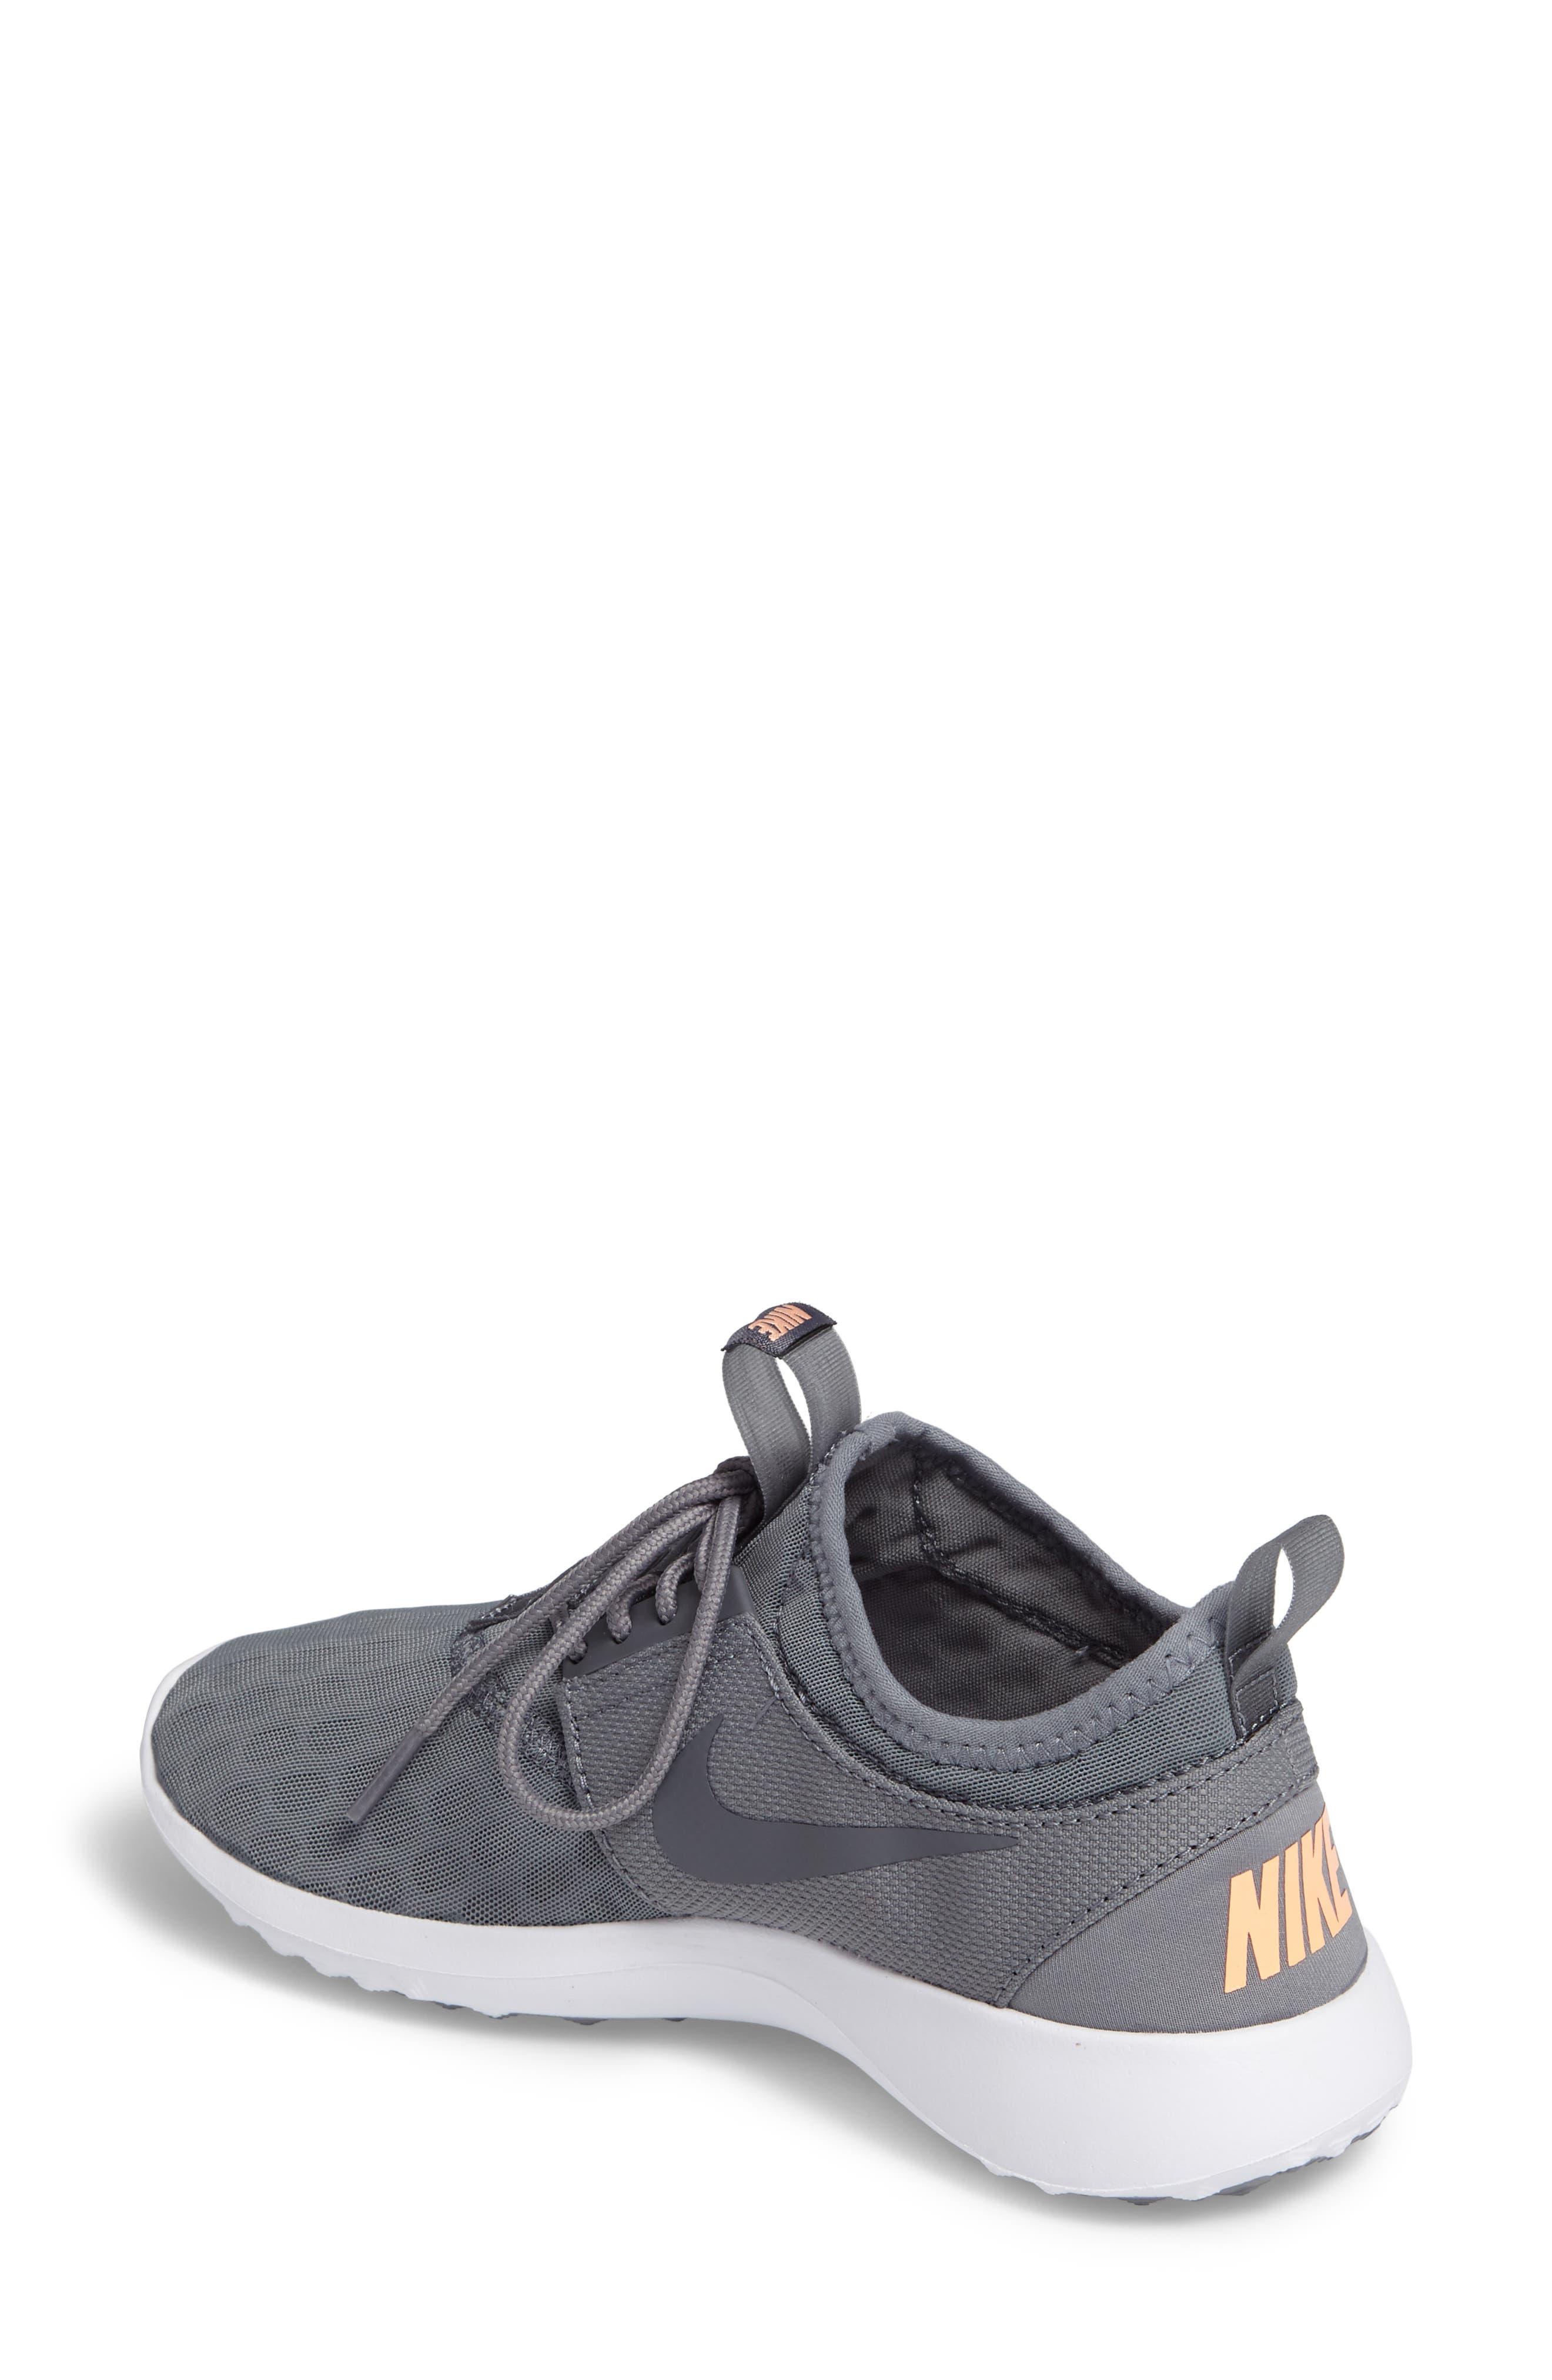 Juvenate Sneaker,                             Alternate thumbnail 74, color,